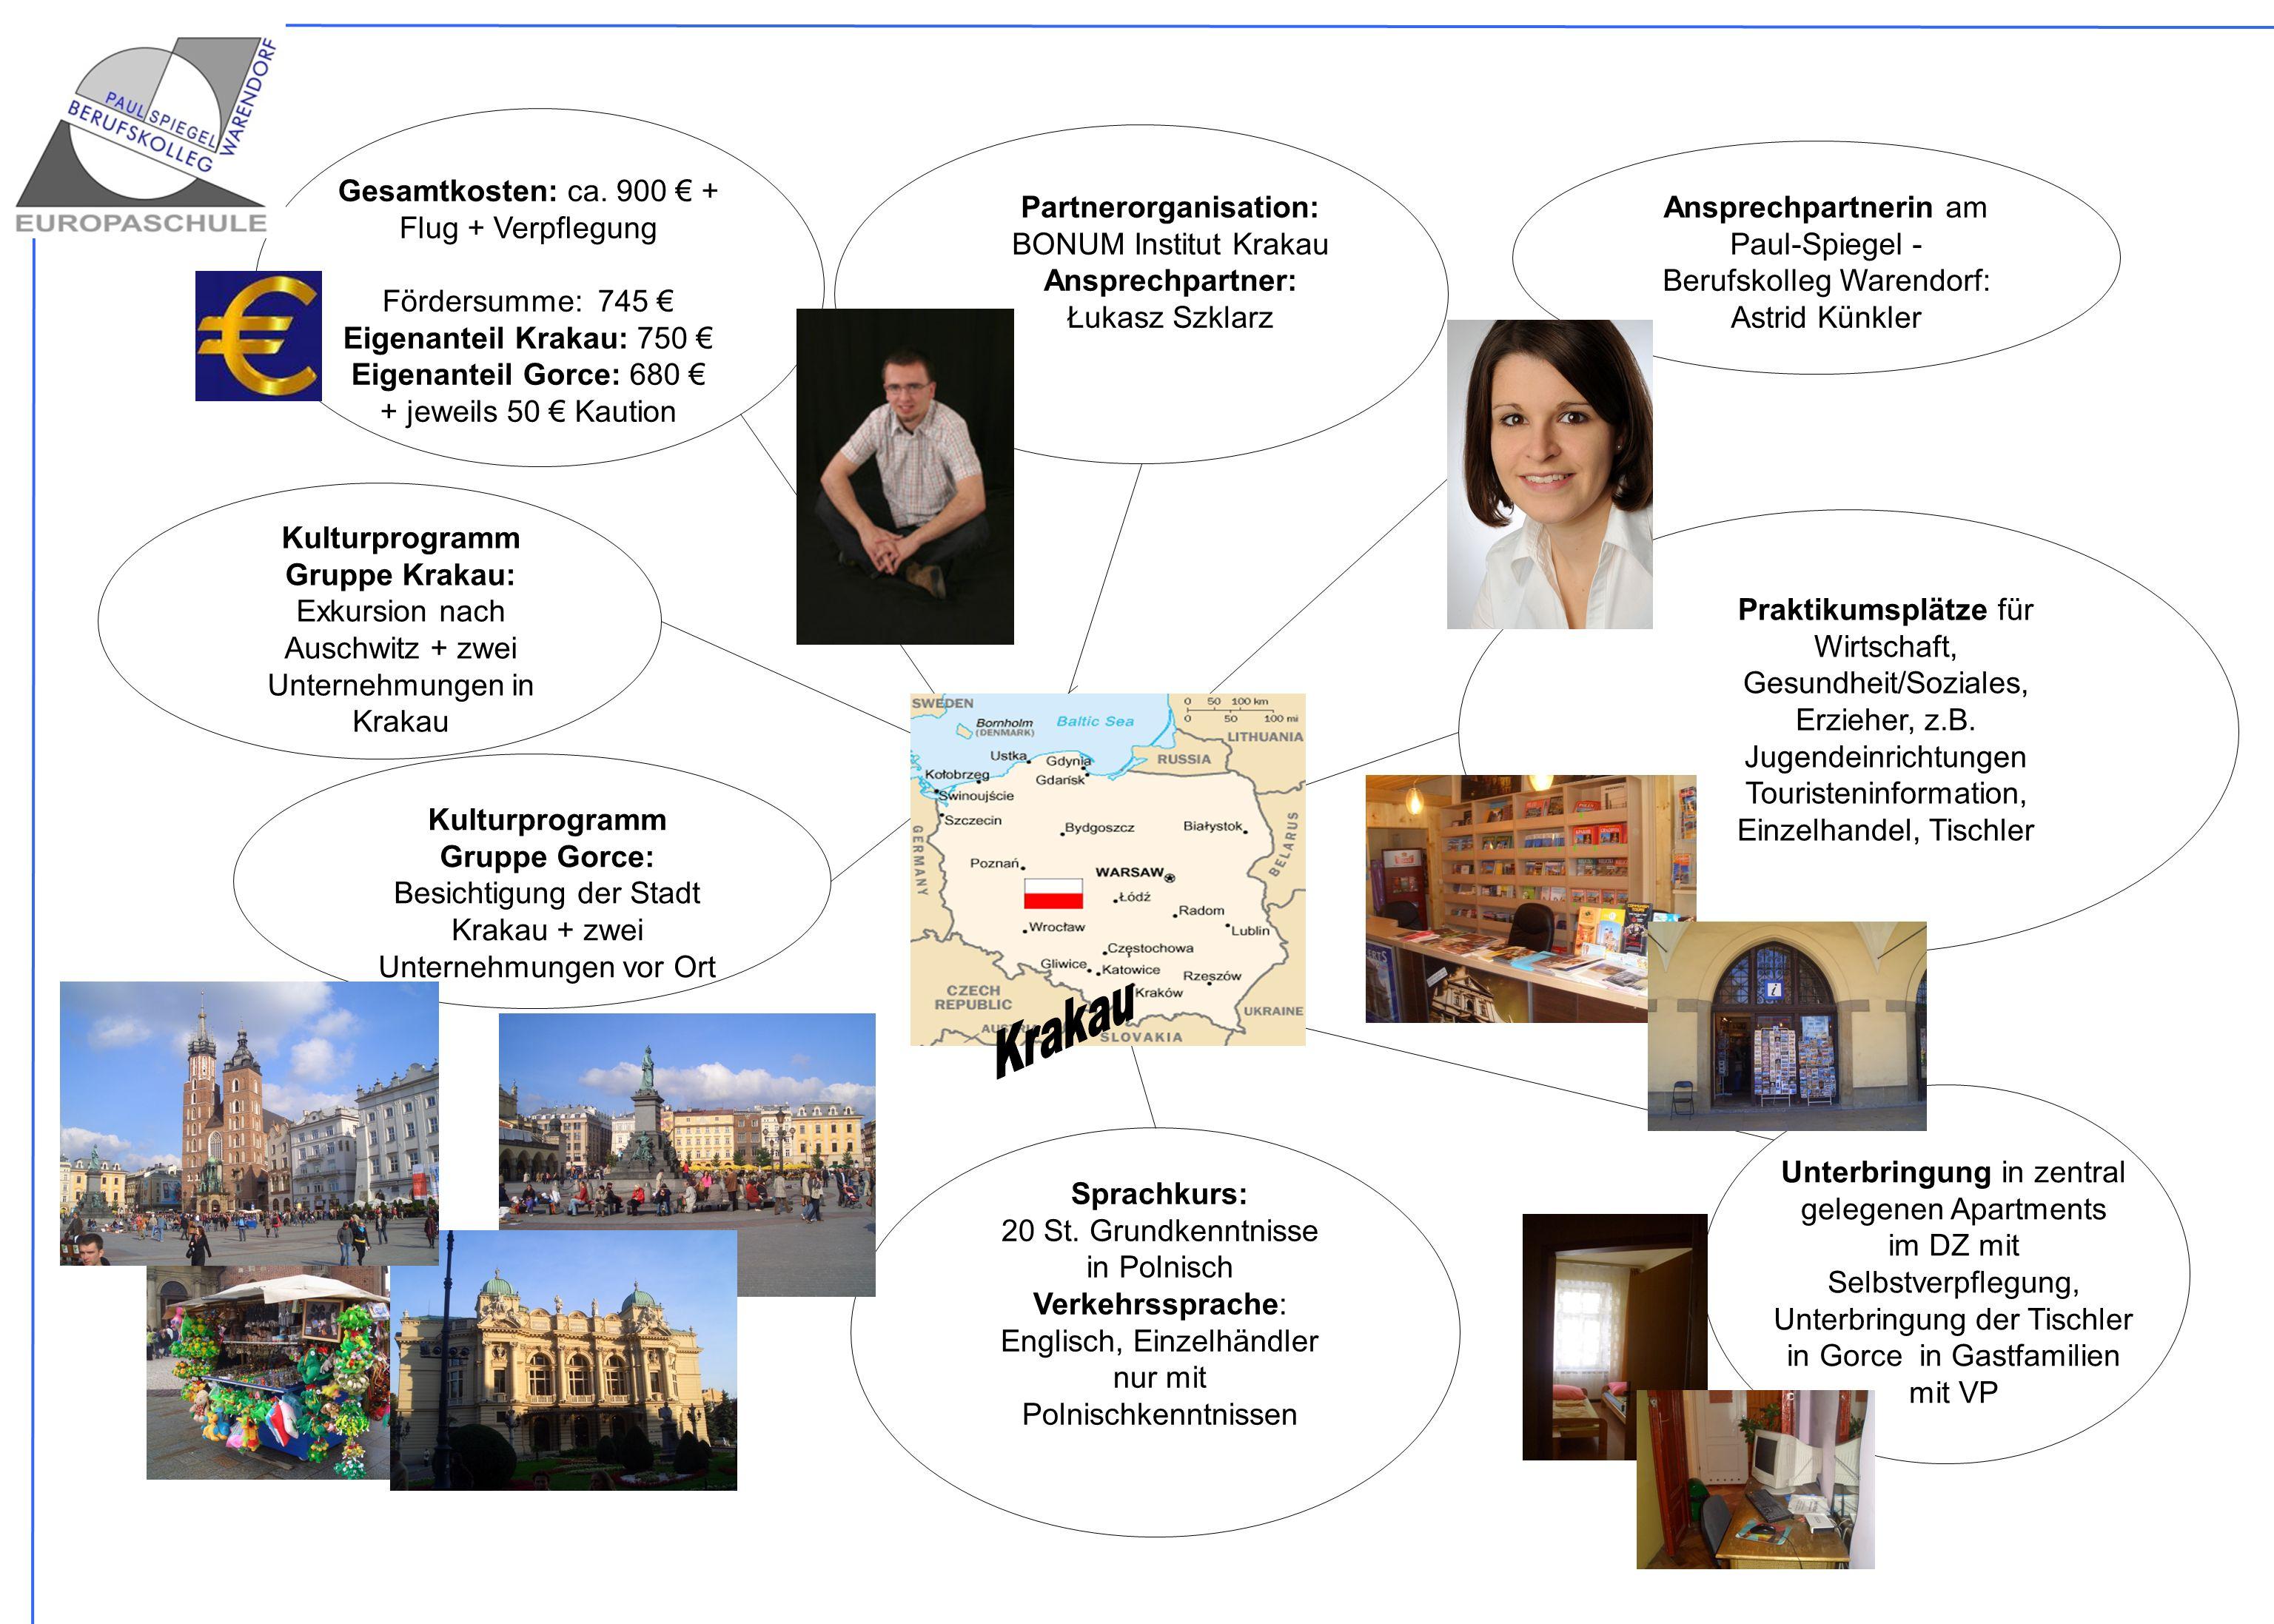 Partnerorganisation: Kulturprogramm Gruppe Krakau: